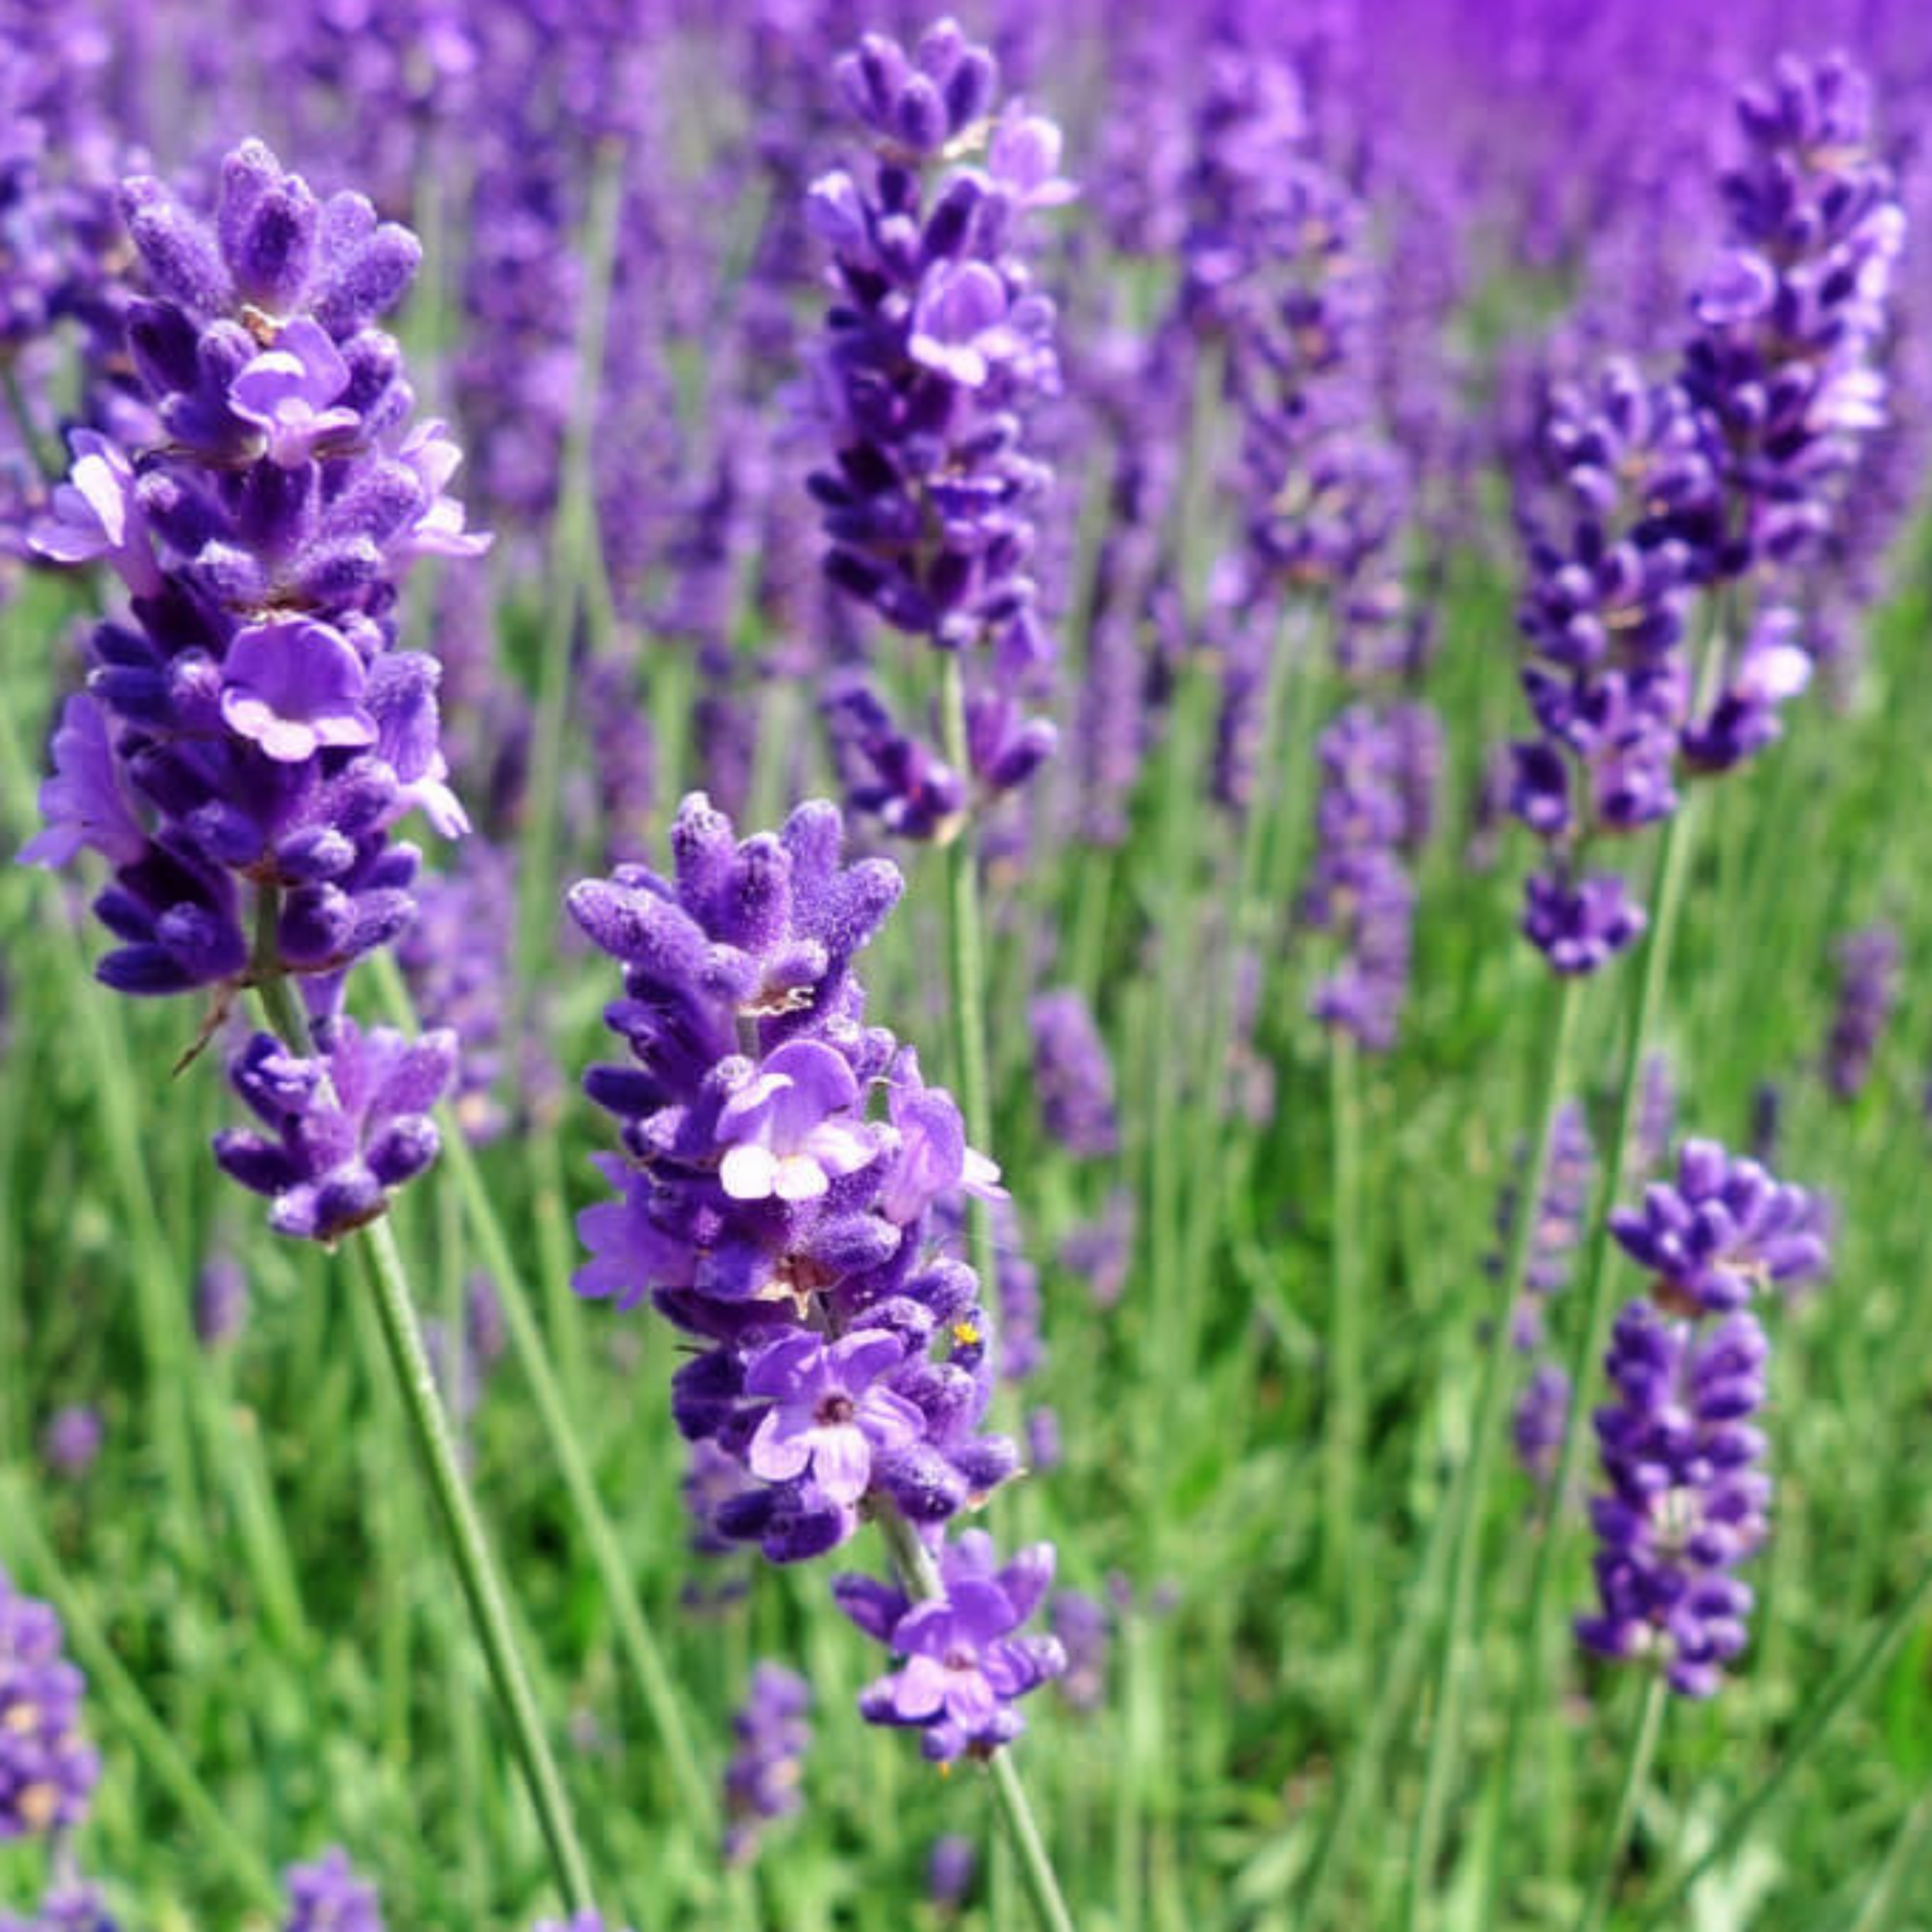 Echter Lavendel, lavandula angustifolia, Anbau, BIO